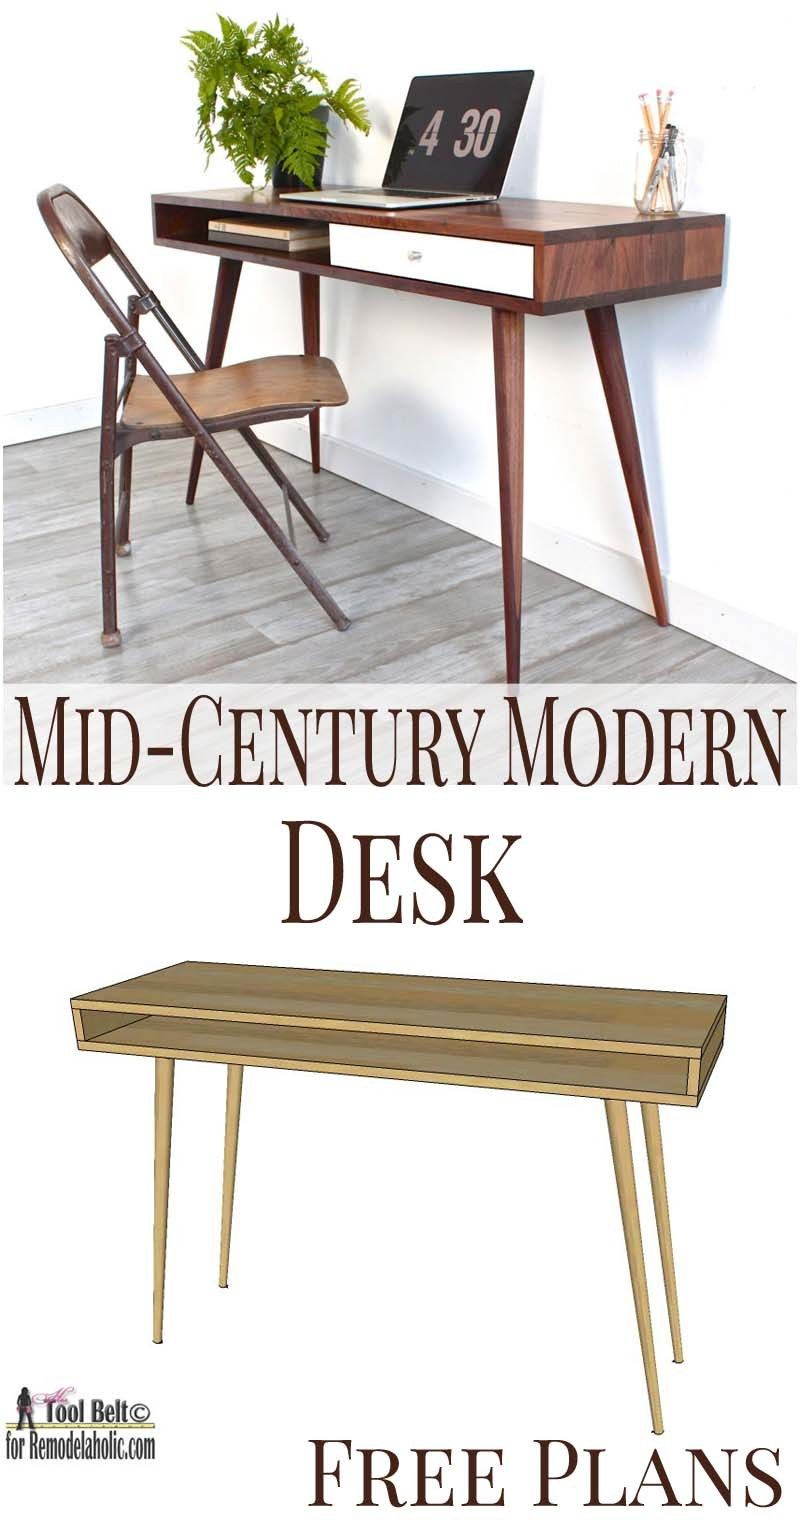 Diy Mid Century Modern Desk Mid Century Modern Desk Diy Furniture Mid Century Modern Furniture